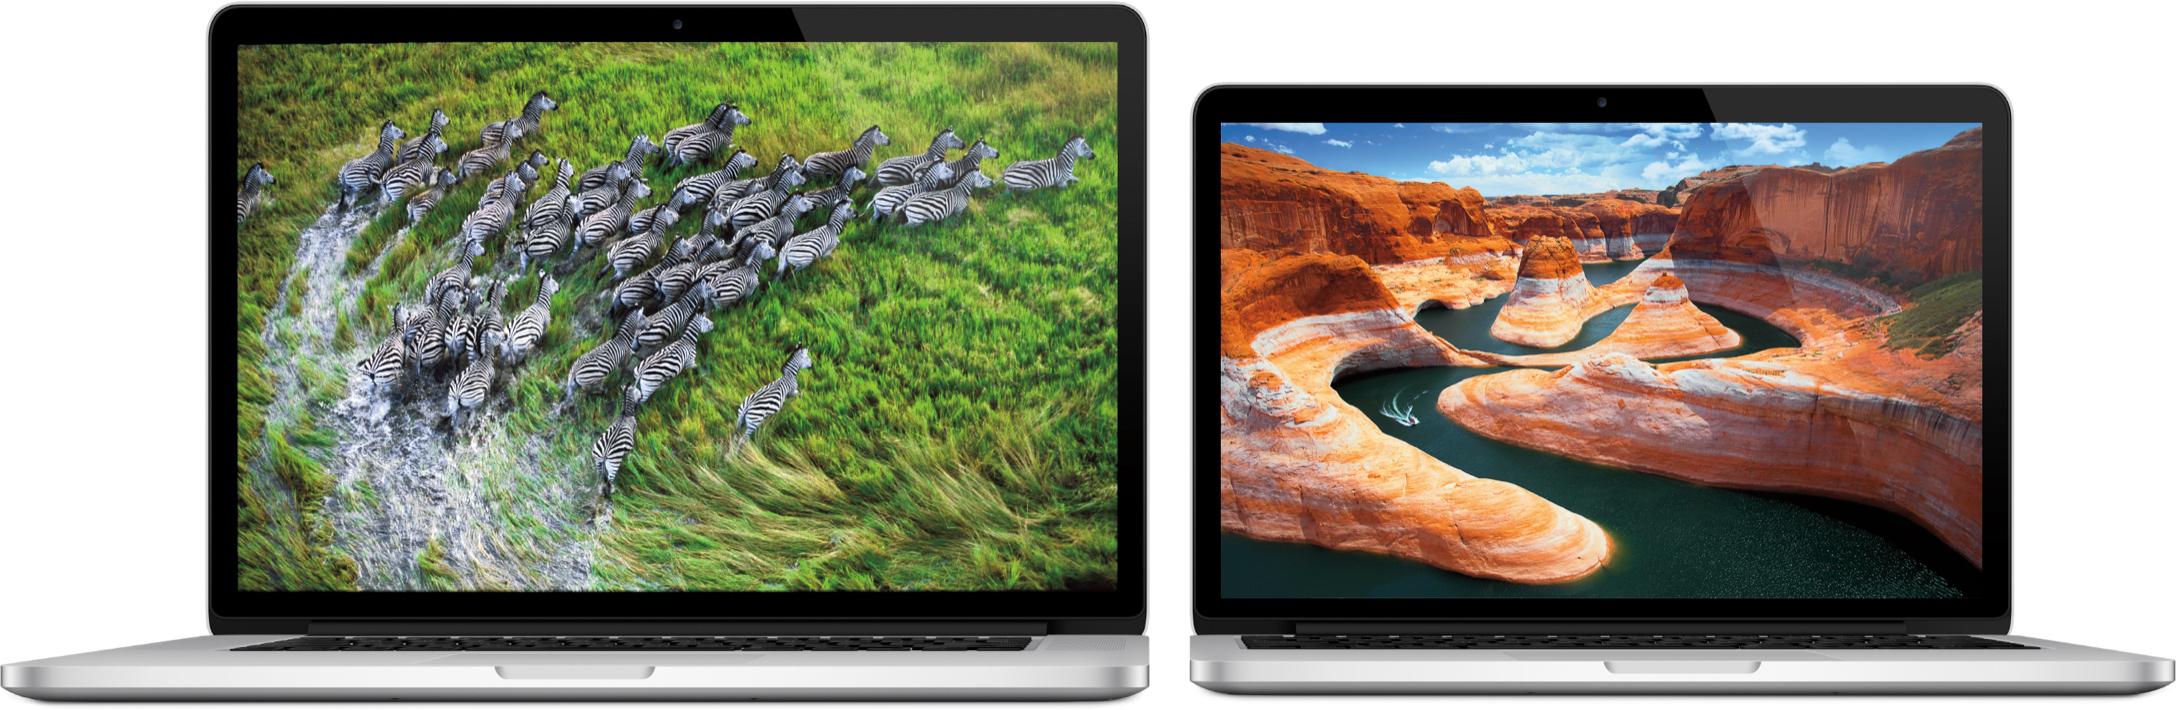 Novos MacBooks Pro lado a lado